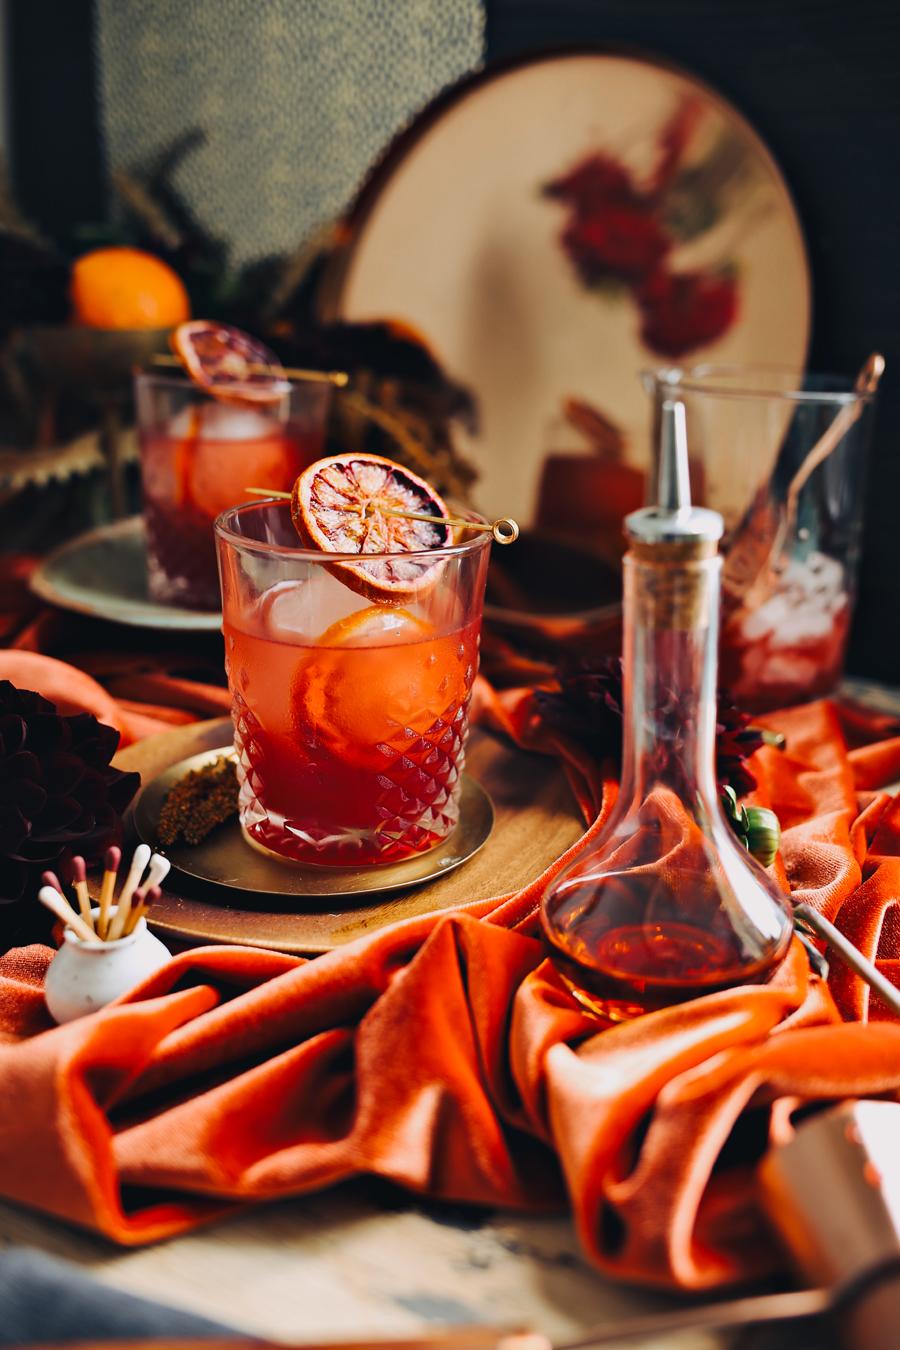 05_Smoked-Blood-Orange-Boulevardier-Dine-X-Design.jpg